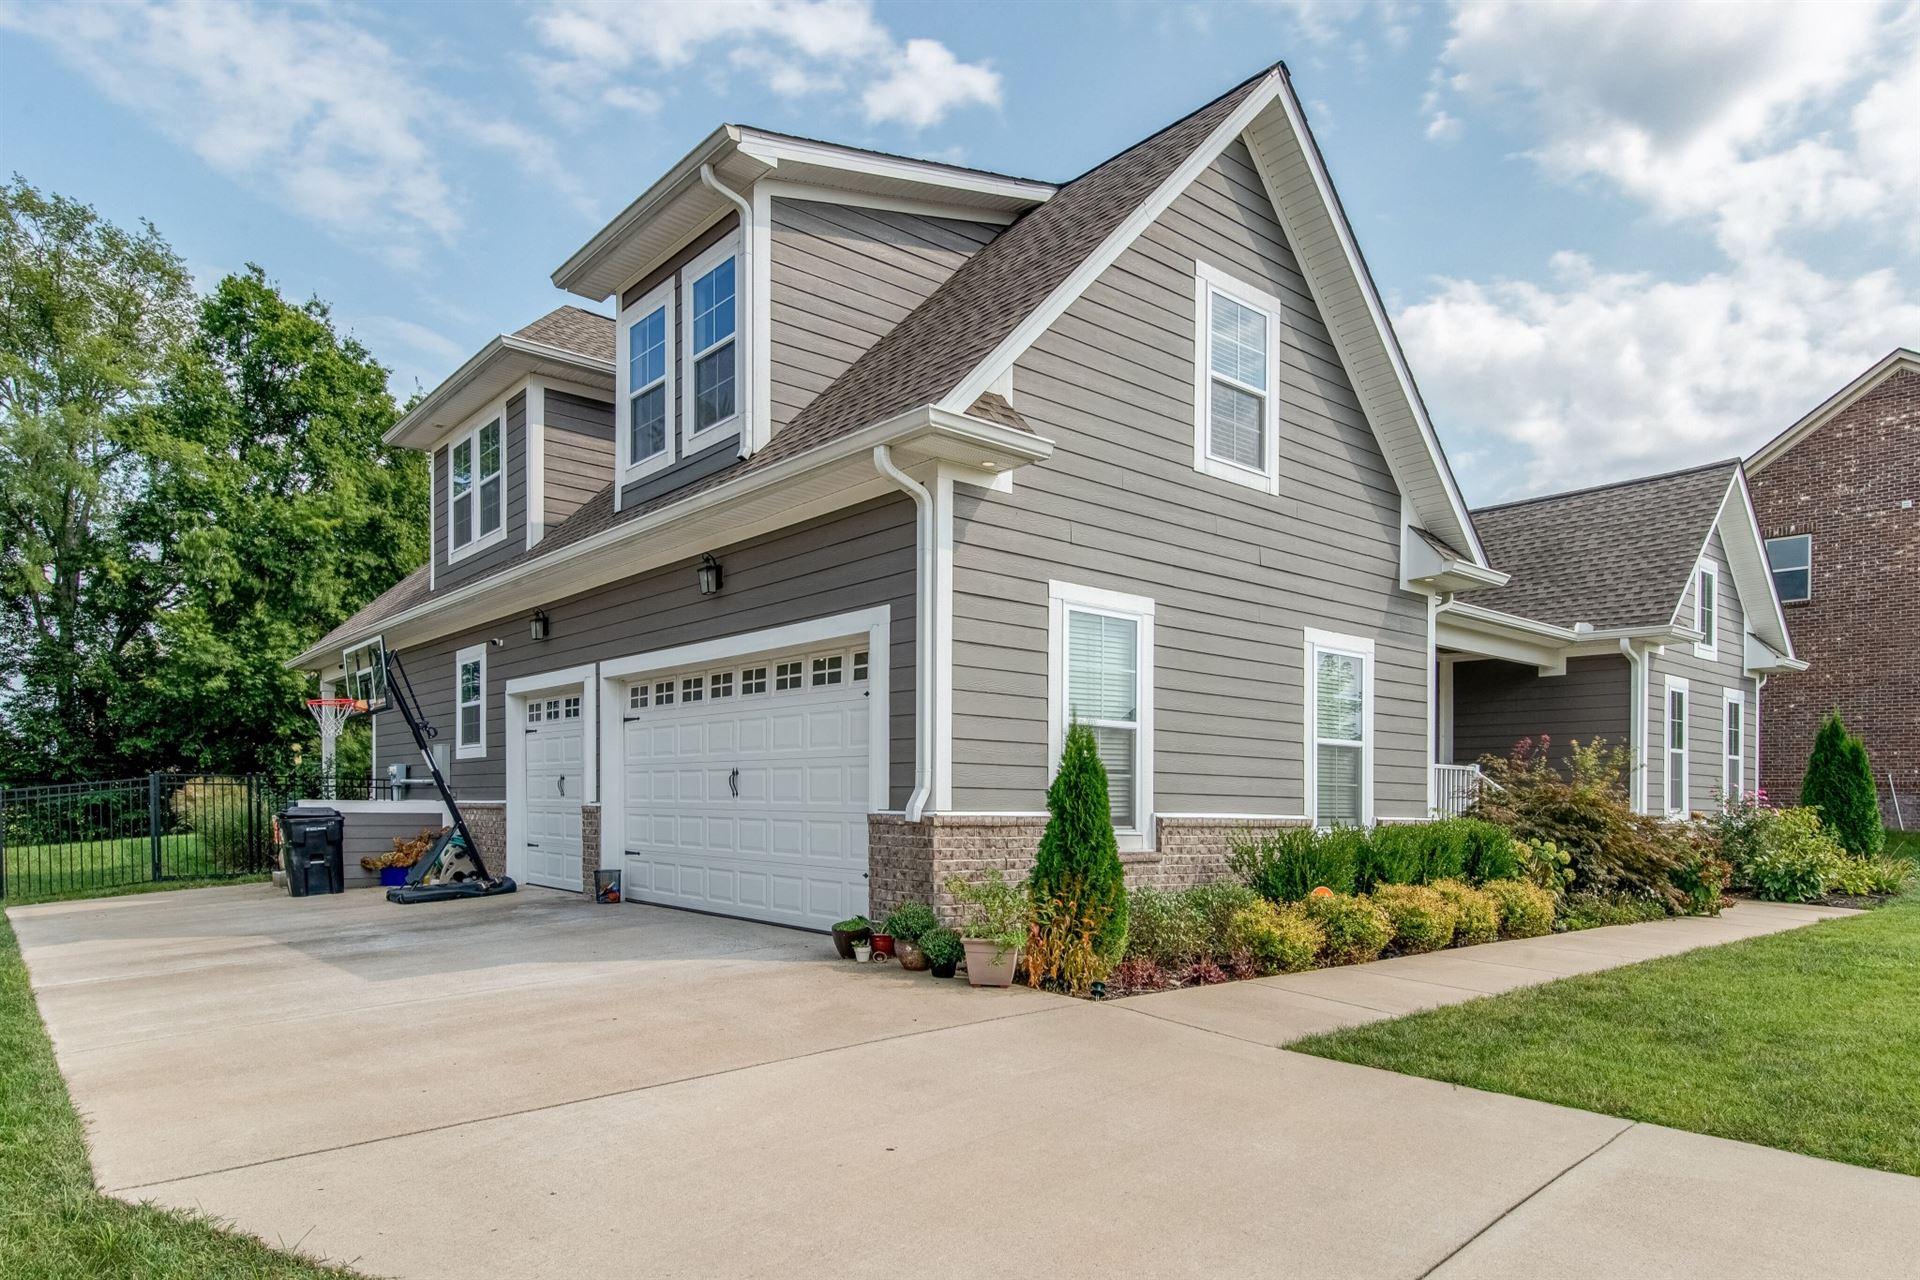 723 Orange Blossom Ct, Murfreesboro, TN 37130 - MLS#: 2281093